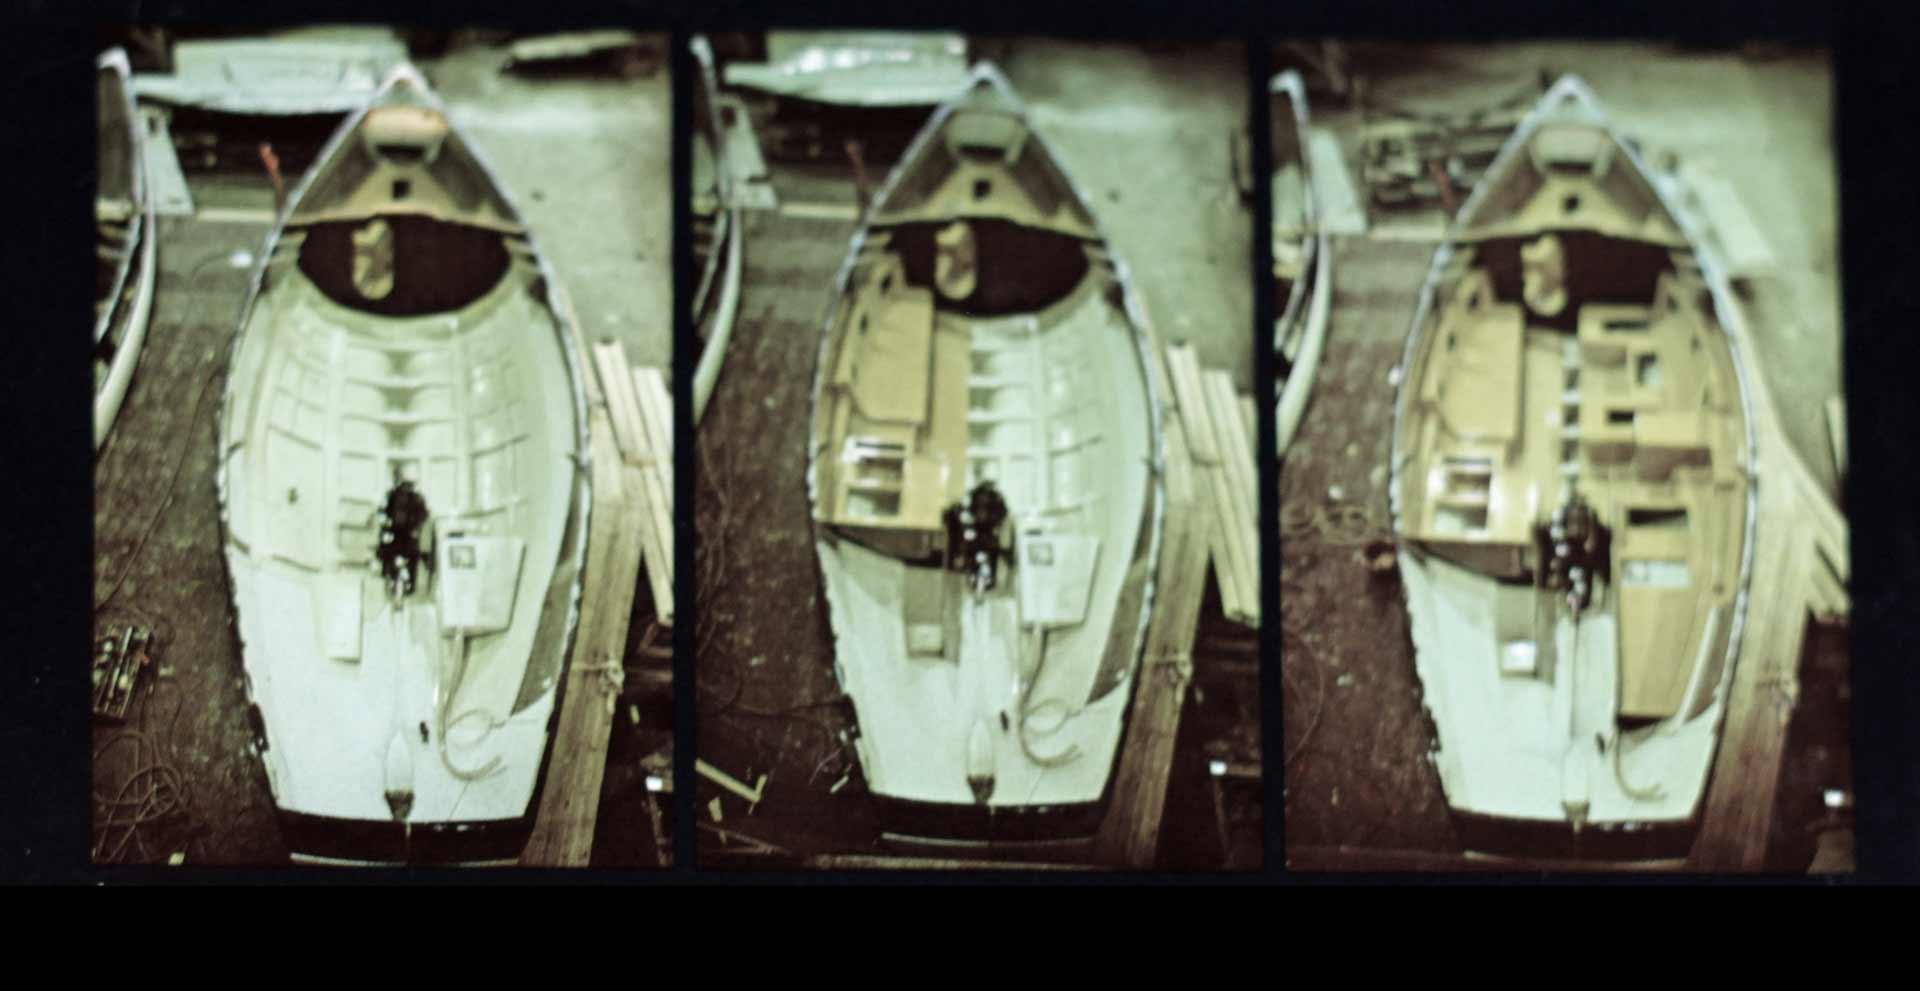 Outer and Inner Shels of the Kingscruiser 33 Hull